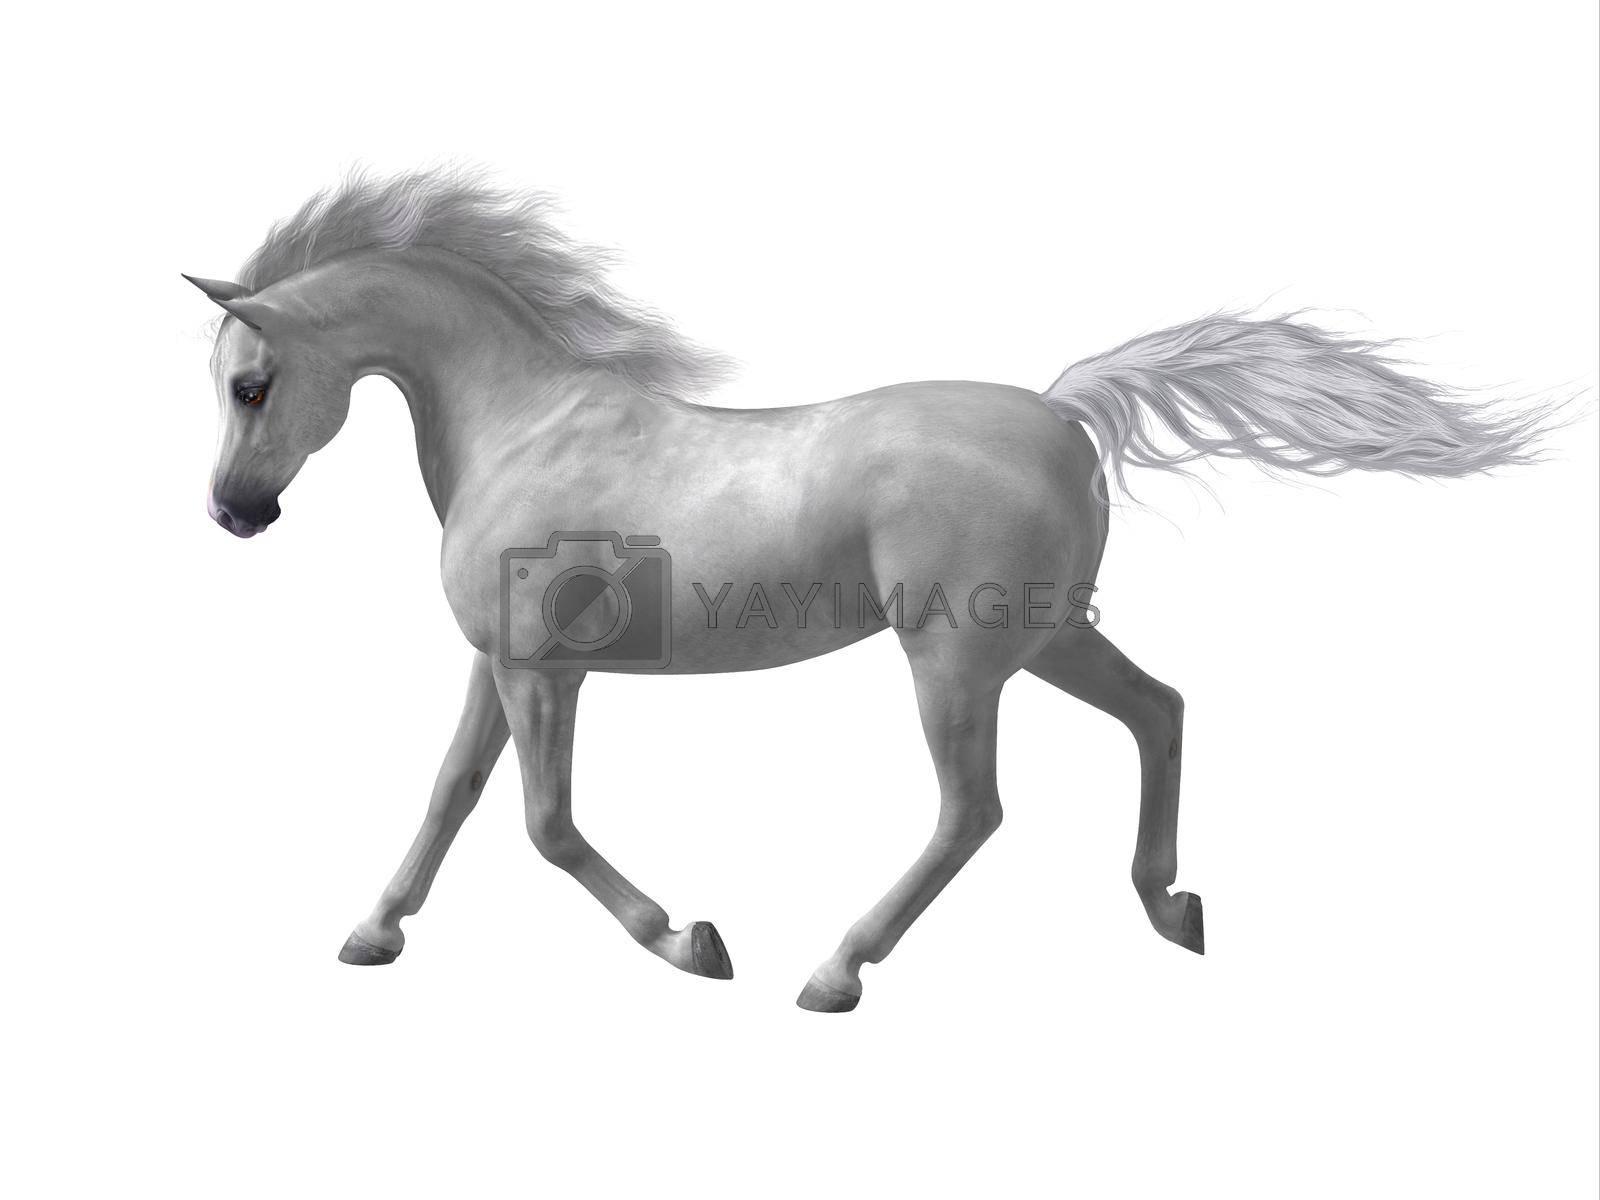 Royalty free image of Arabian Horse by Catmando